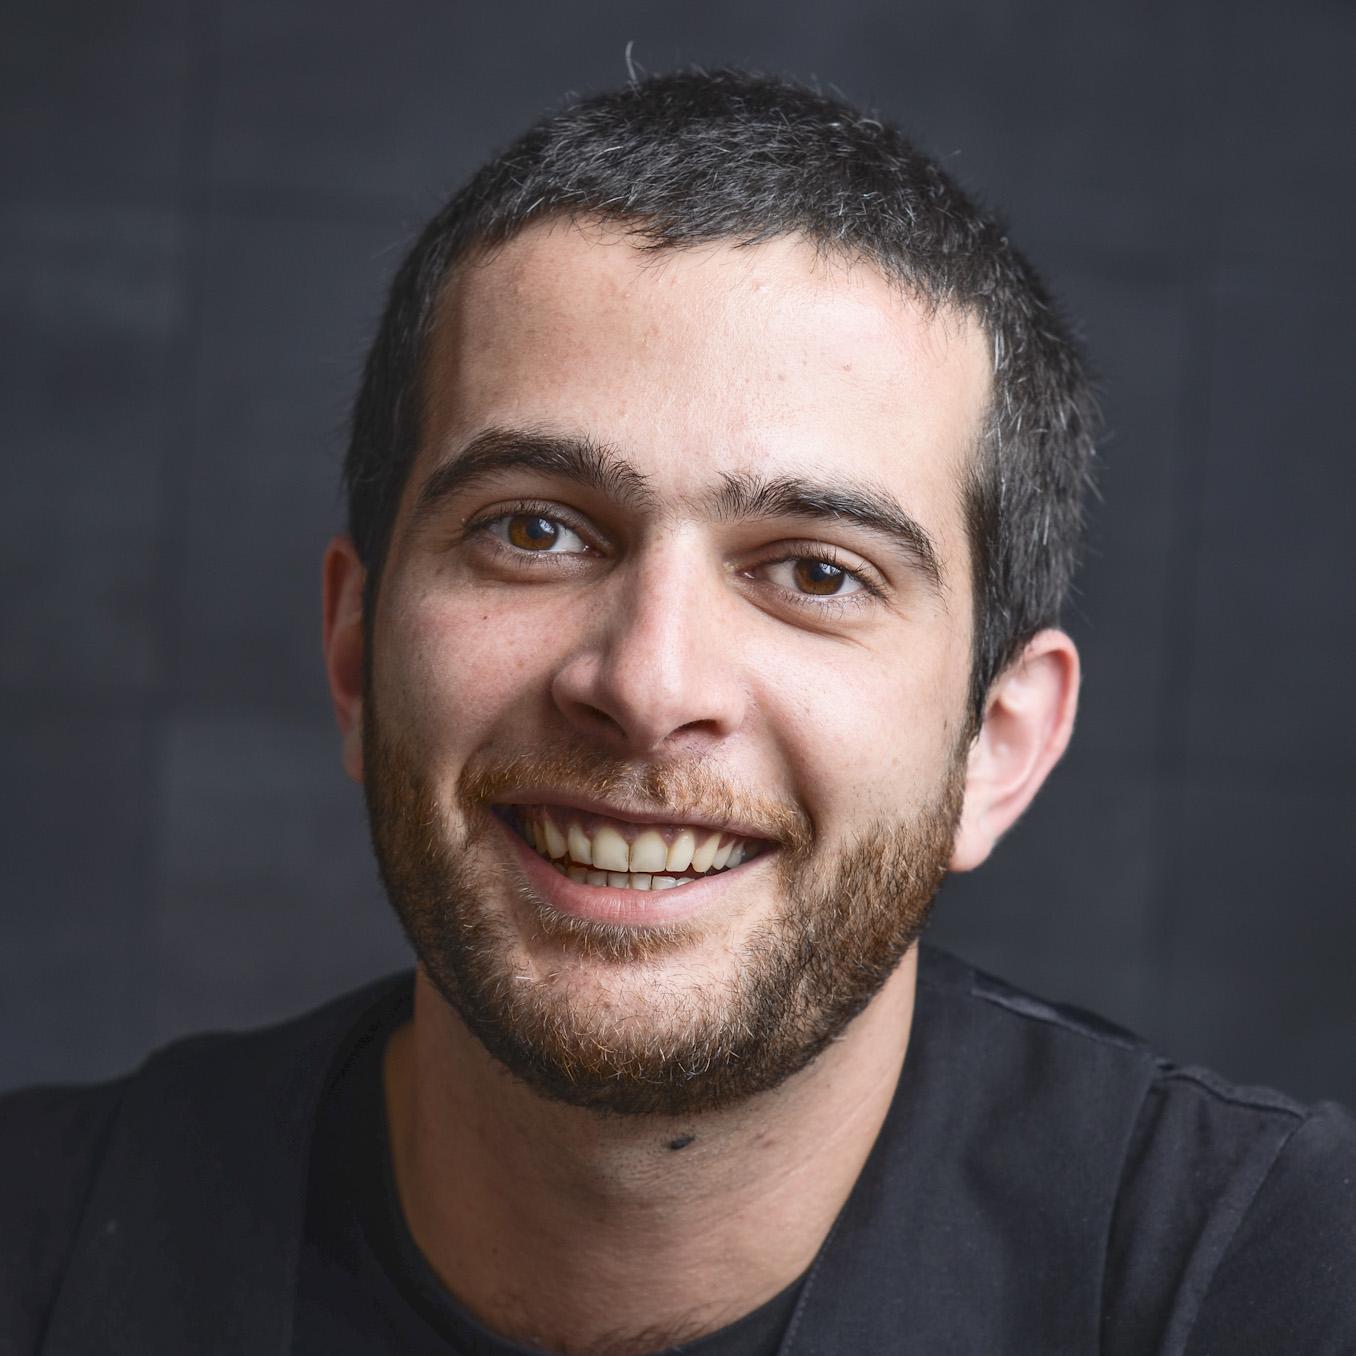 André Mendonça, PhD